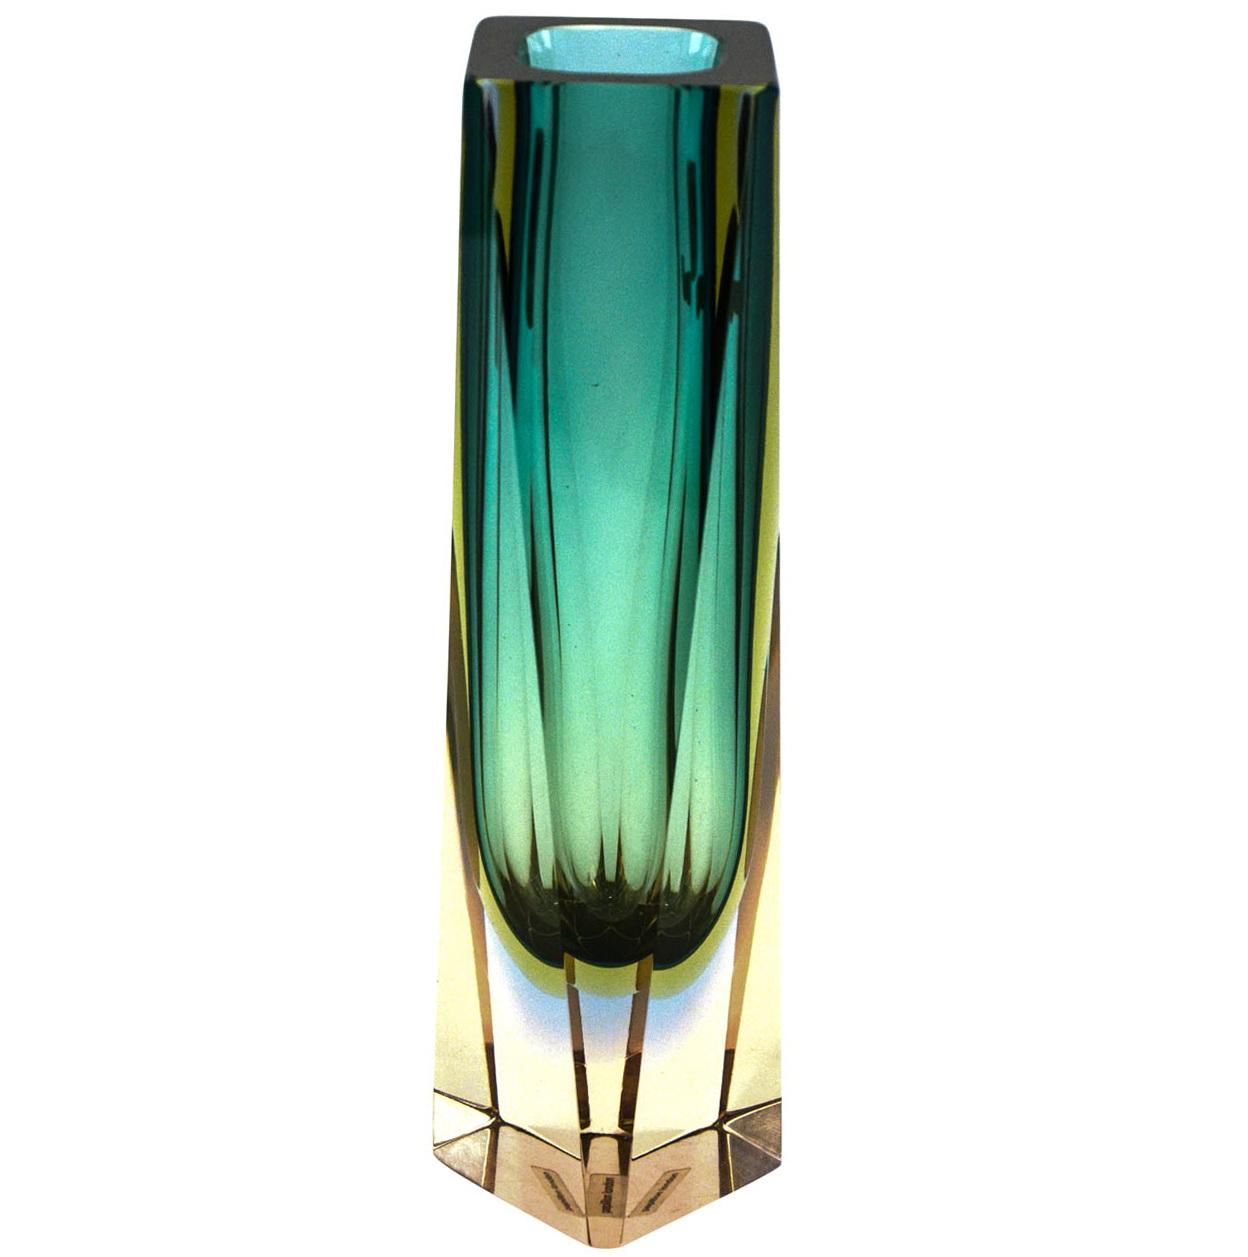 Murano Glass Vase Prices Home Design Ideas